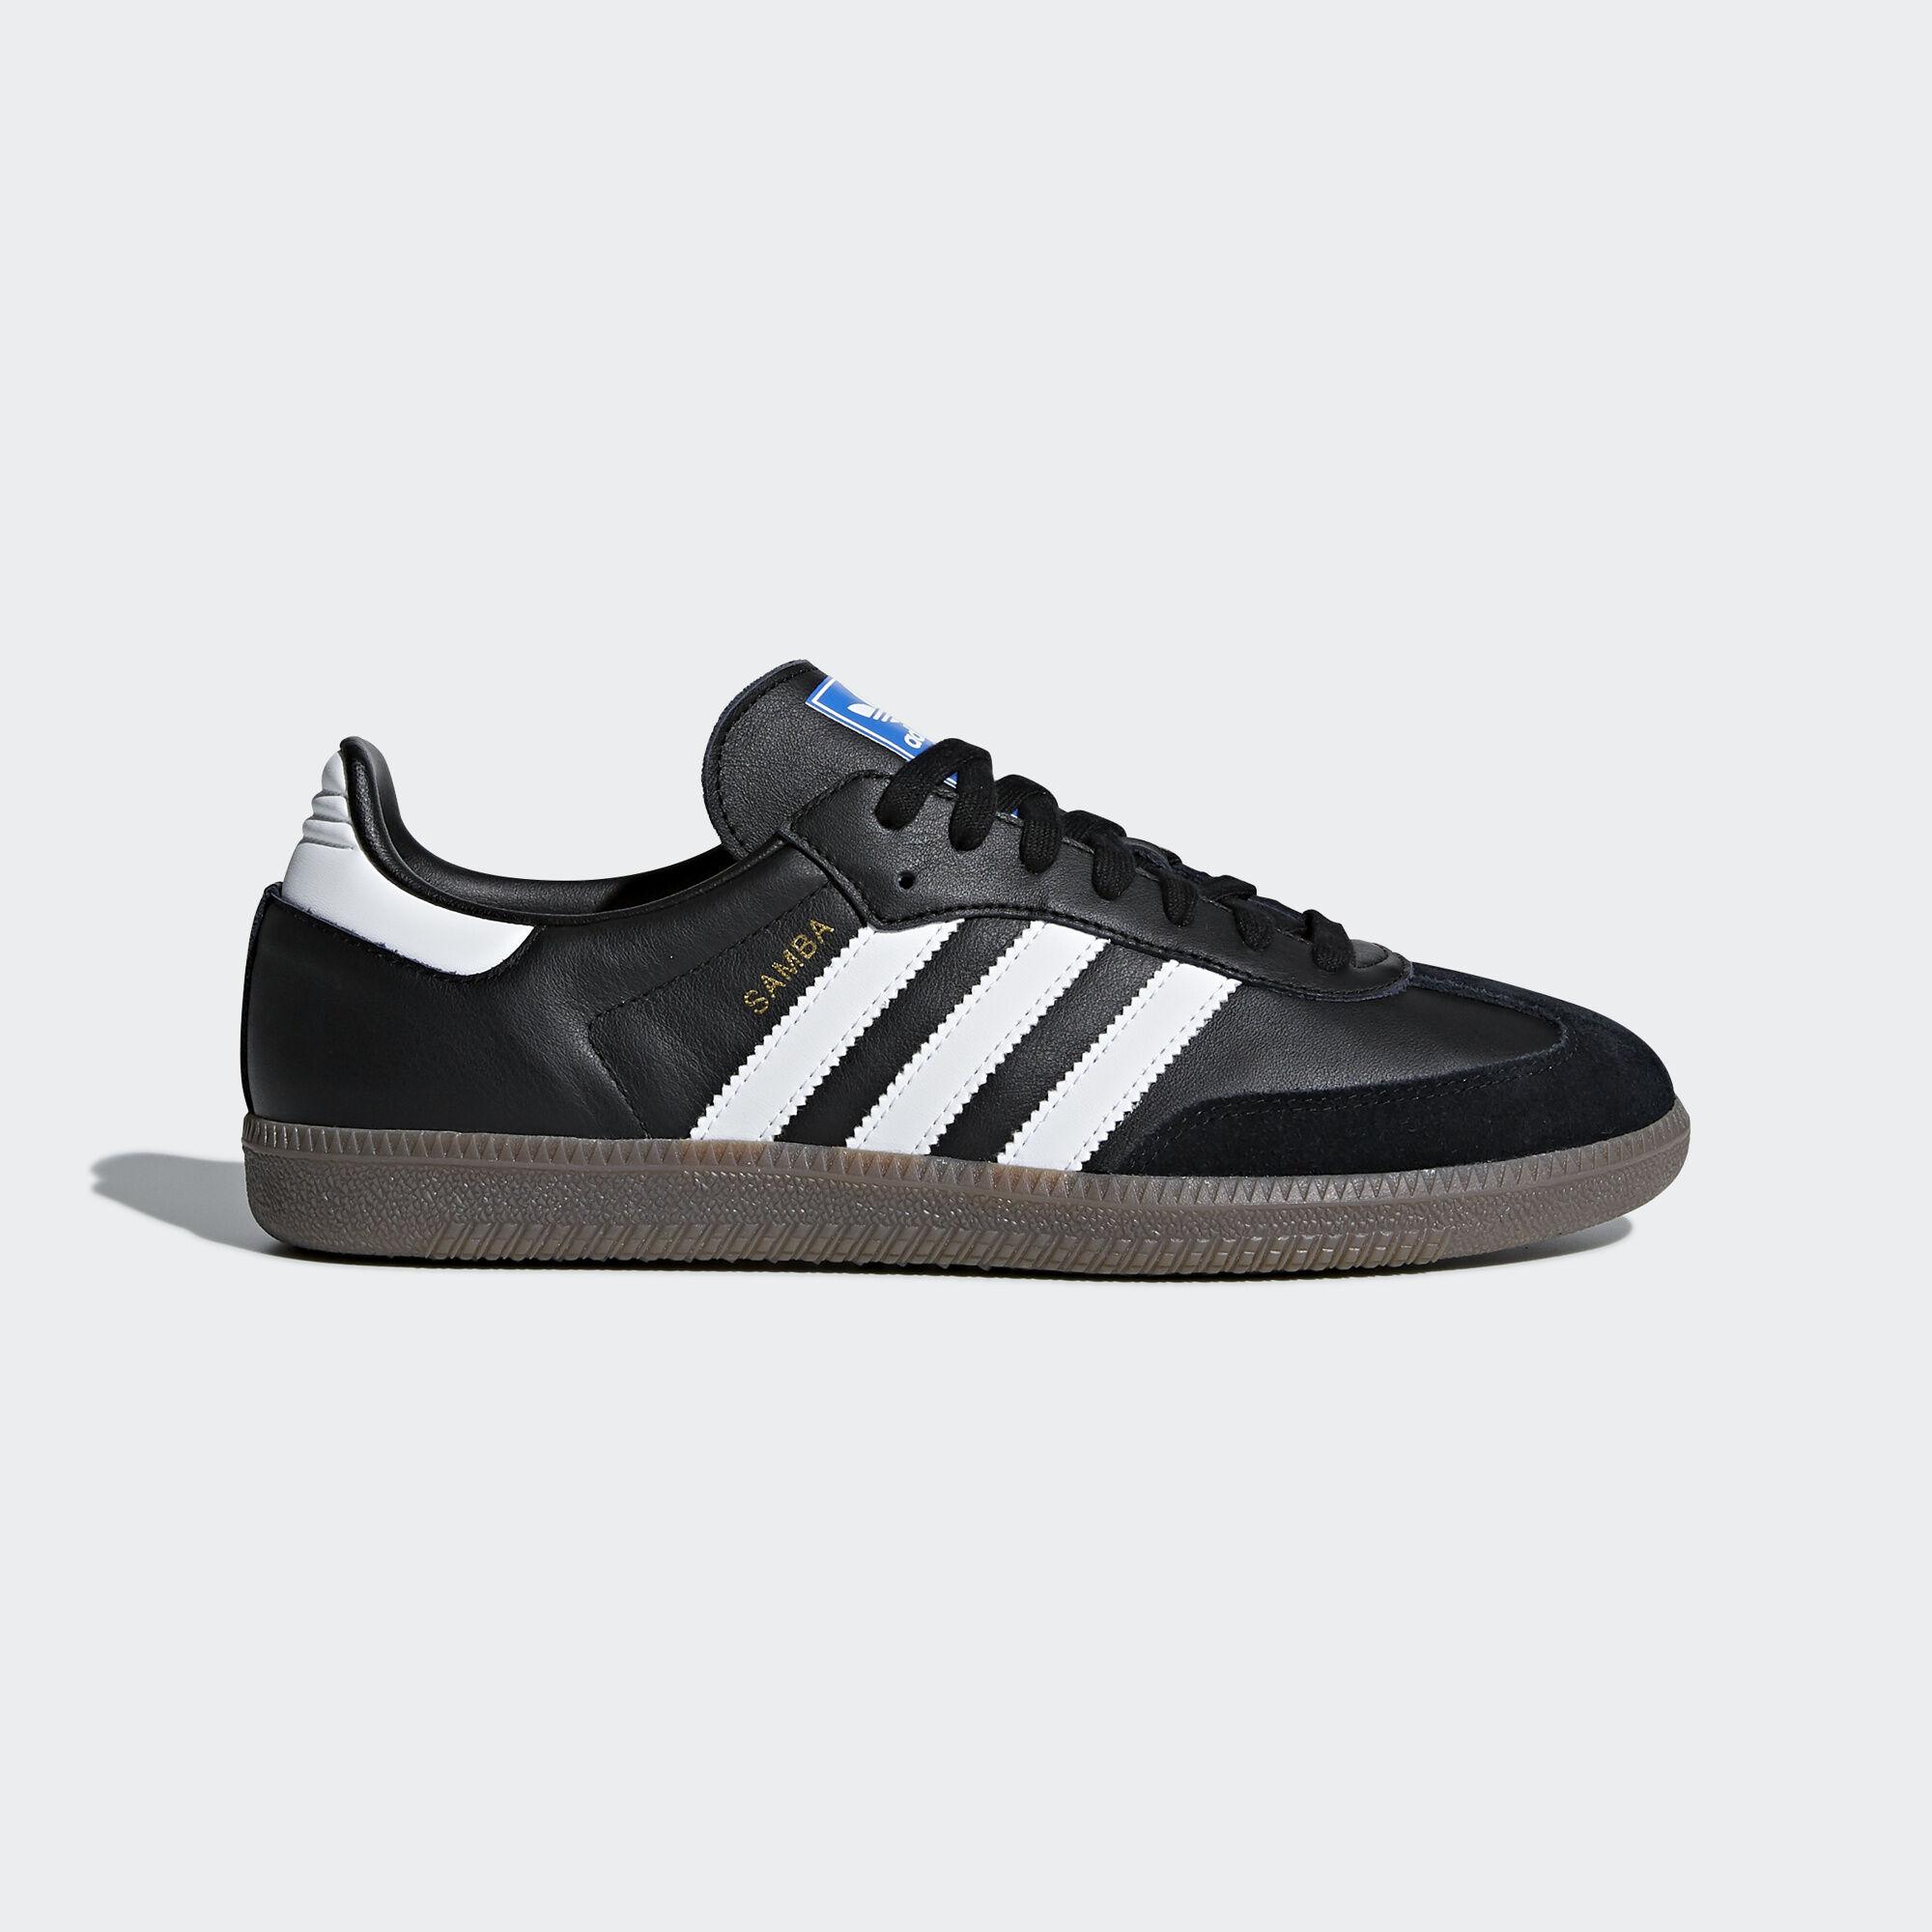 Adidas Zapatilla Samba OG  Gris (Steel) Kavat Västerby Wilson Rush Evo Carpet W  Zapatillas de Deporte para Mujer 9HQLe